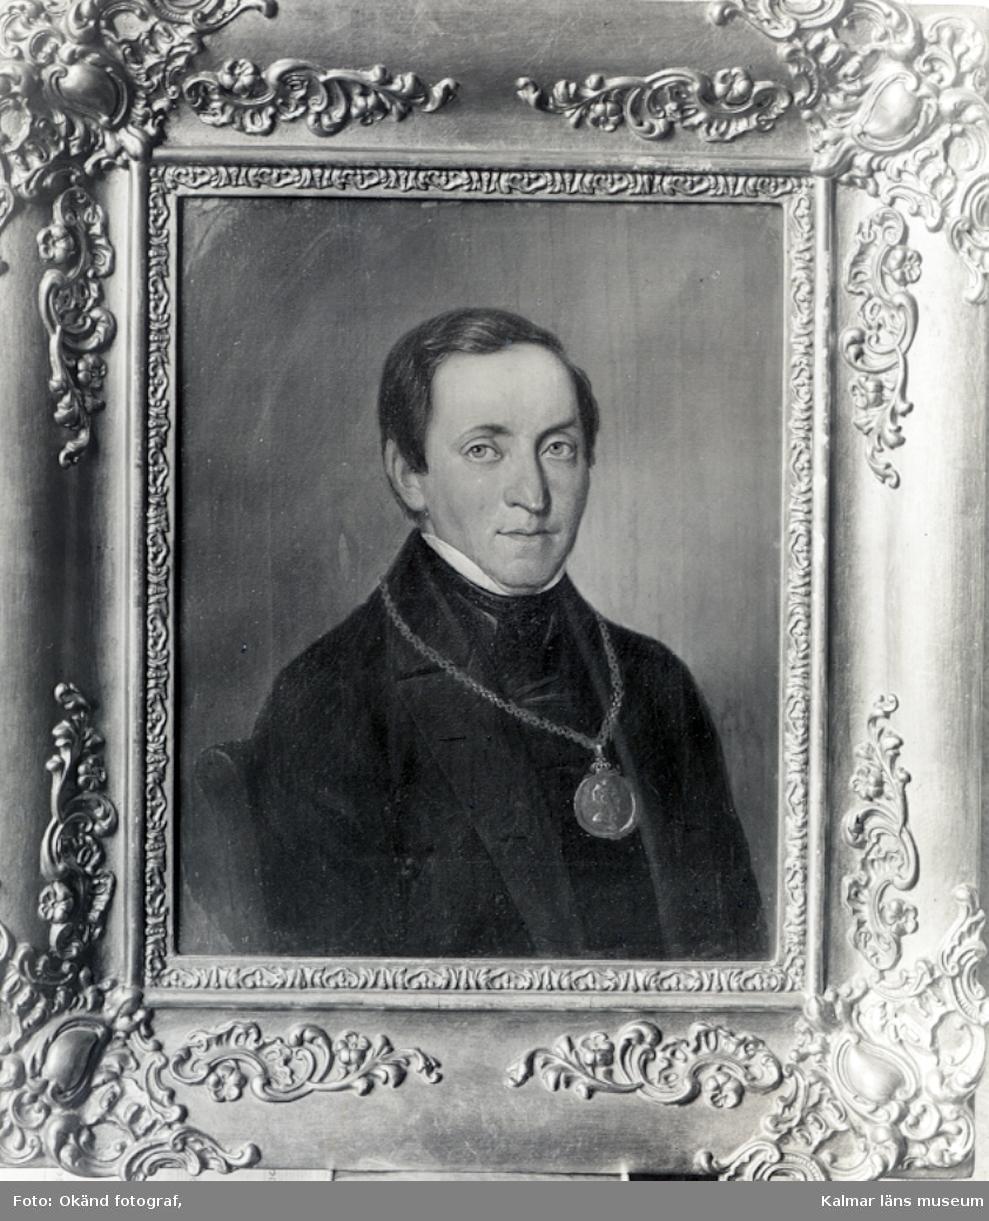 Rogberg C.G. Professor i Uppsala. Dottern gift med biskop Sjöbring i Kalmar. Orginal olja på duk, hos rådman N. Sjöbring, Kalmar.